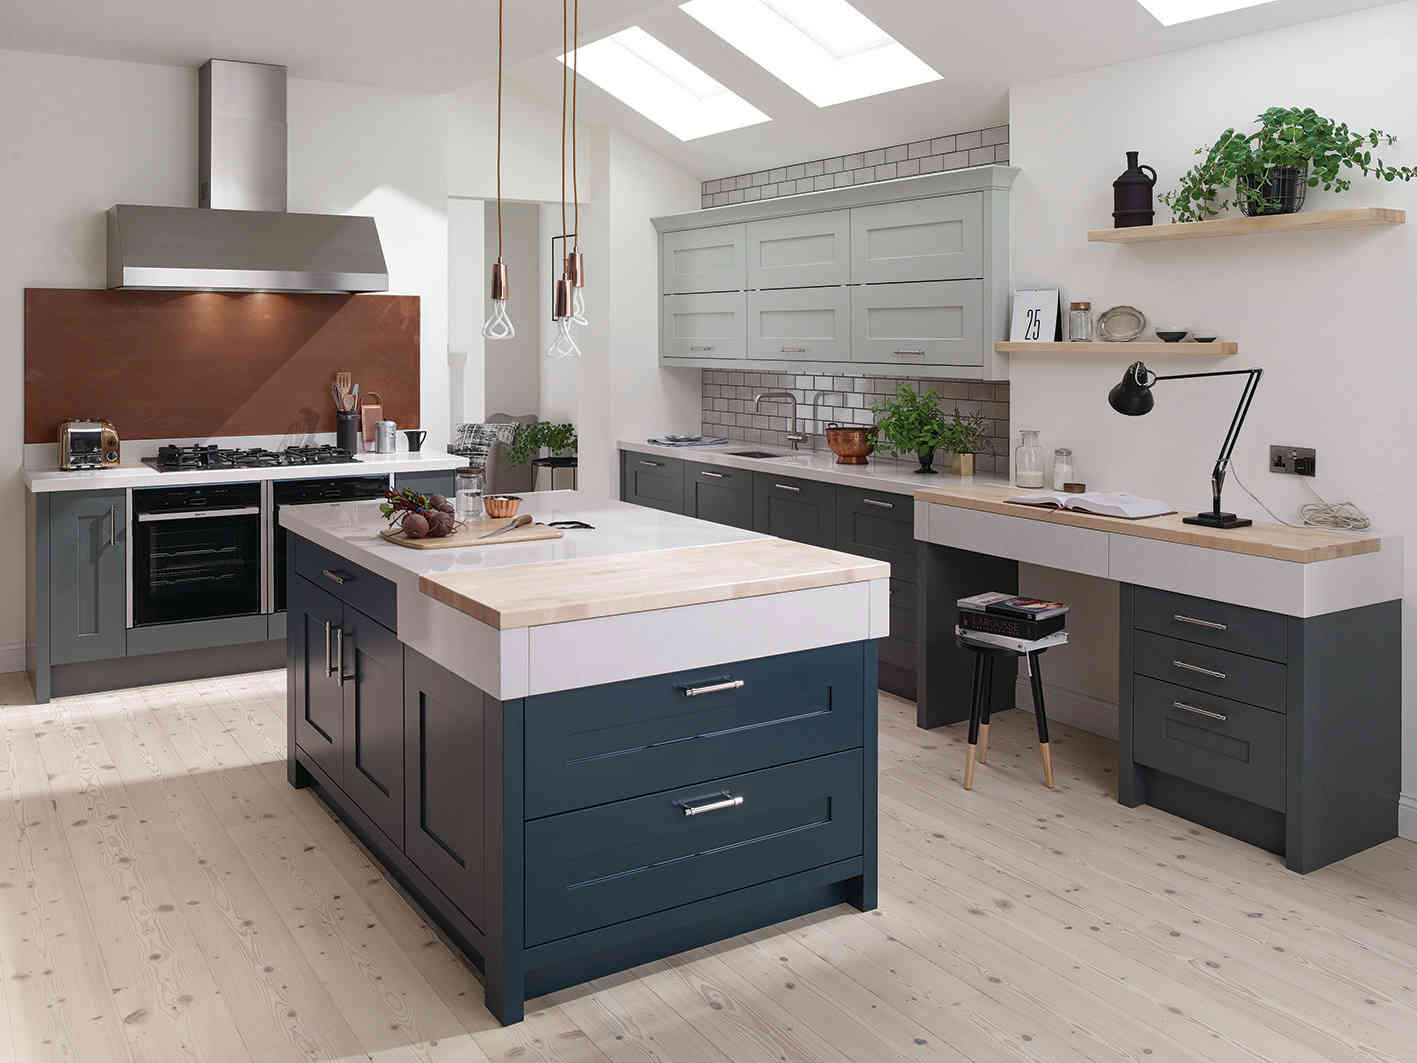 Fitzroy kitchen Hartforth Blue and Partridge Grey Wall